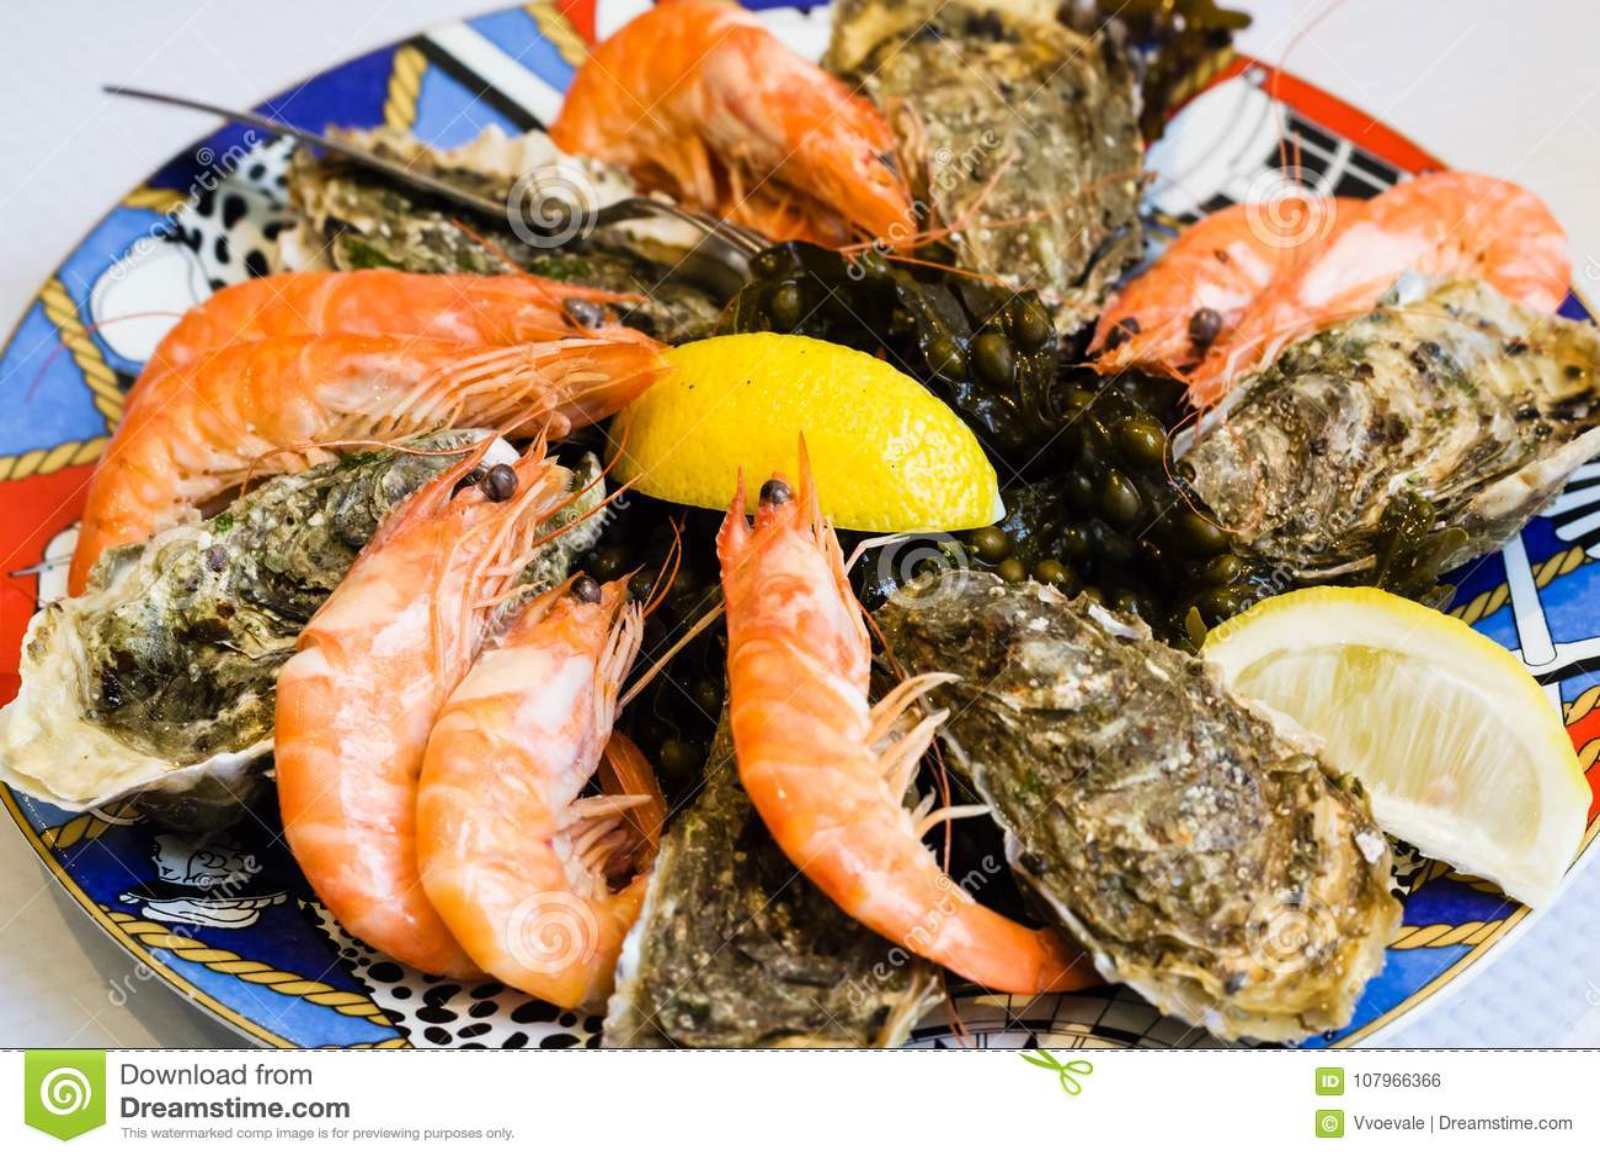 Atlantic Seafood Plate In Local Fish ...